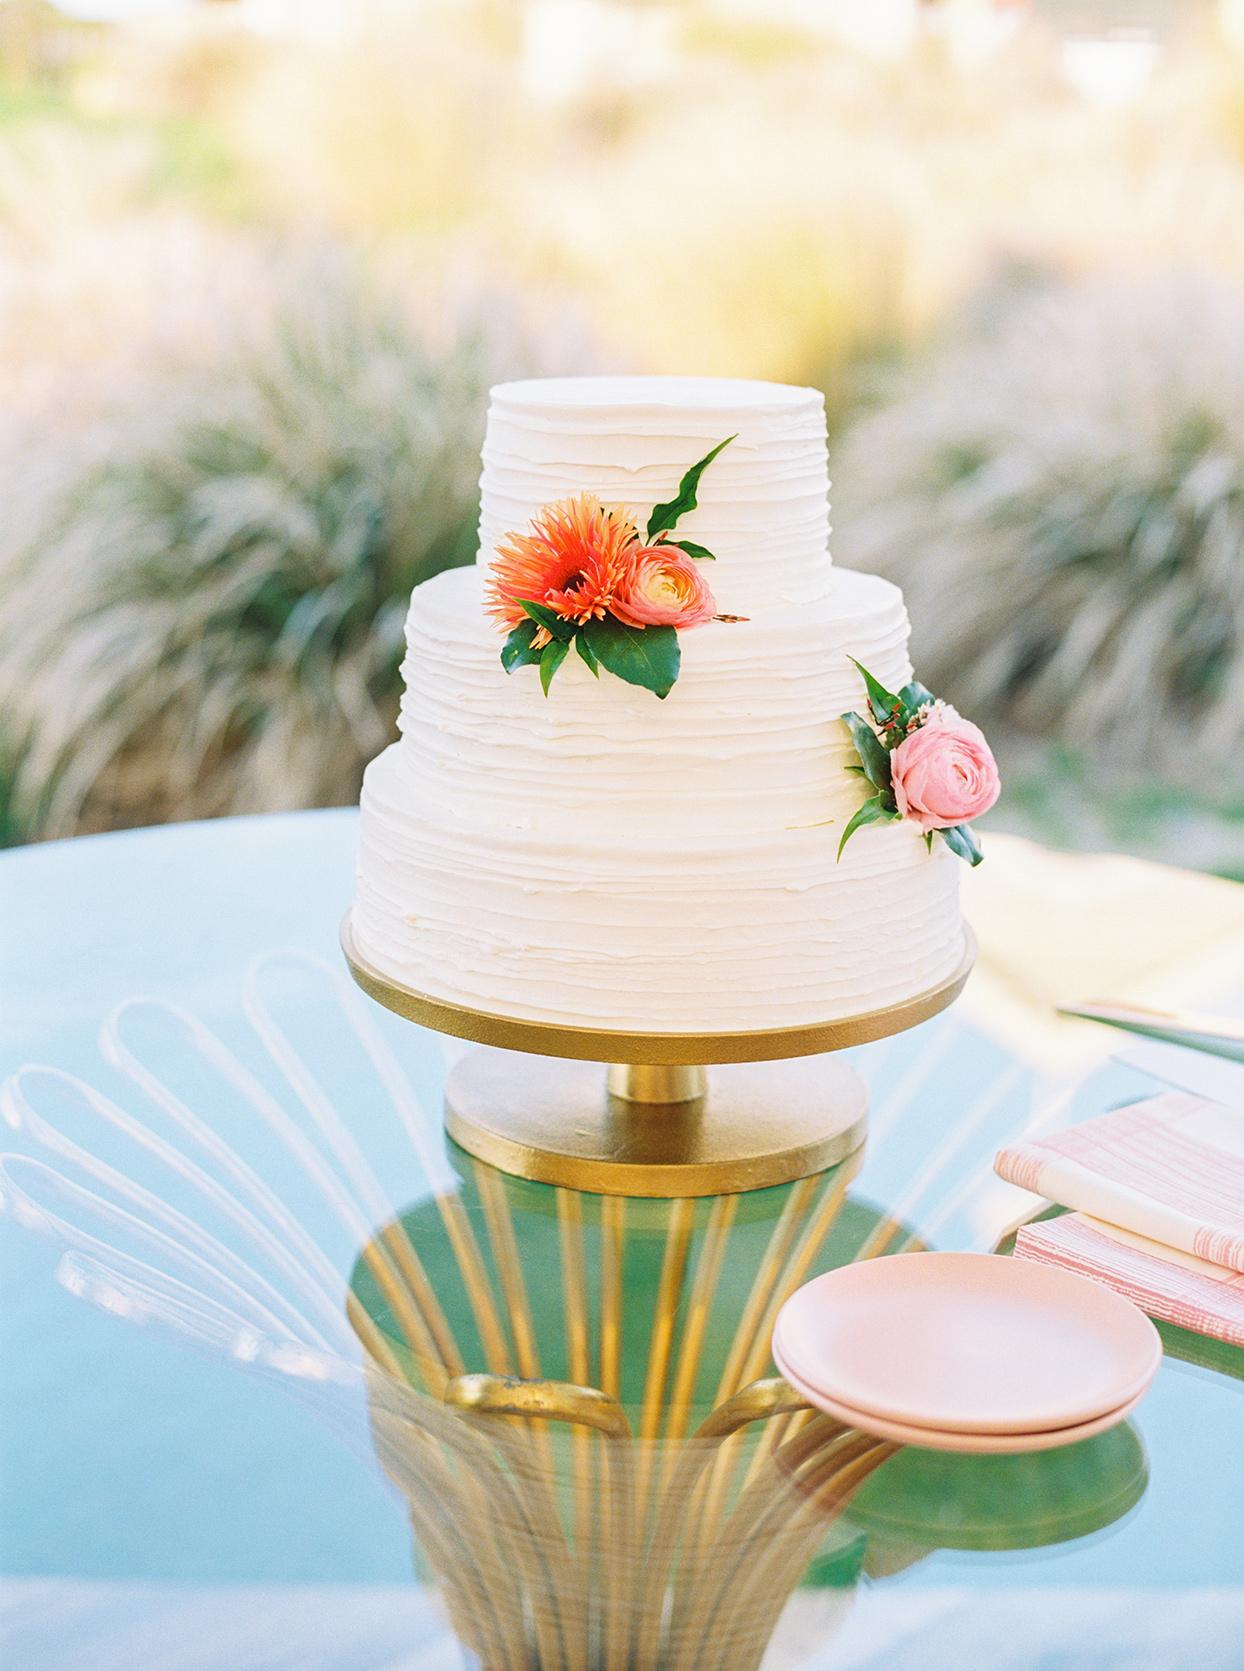 lauren dan simple white wedding cake with pink flowers